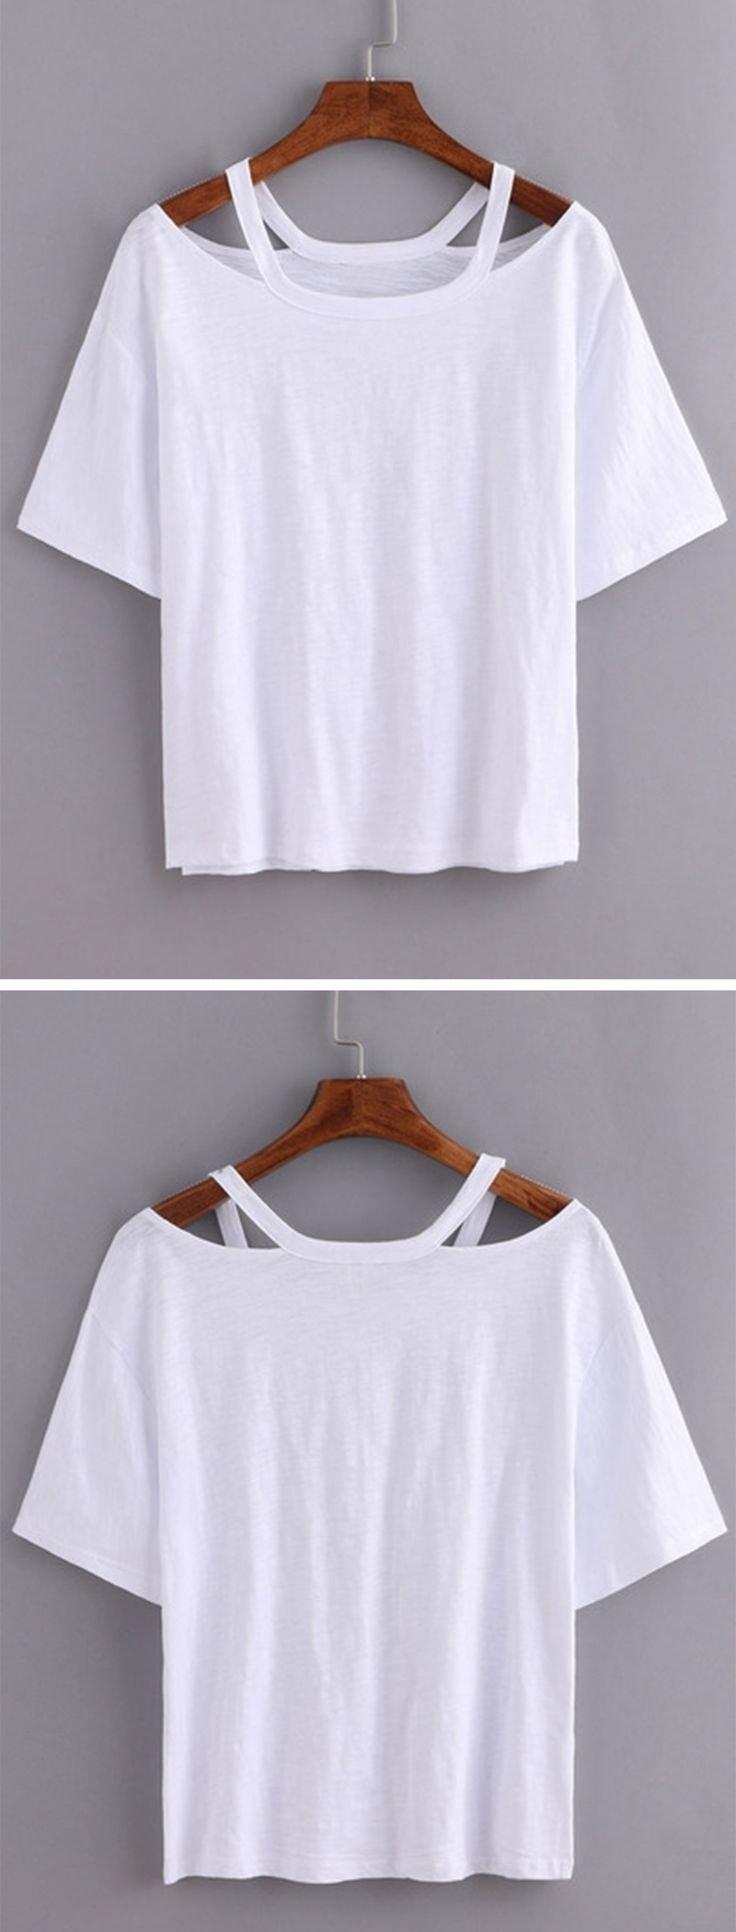 10 Gorgeous Diy T Shirt Design Ideas